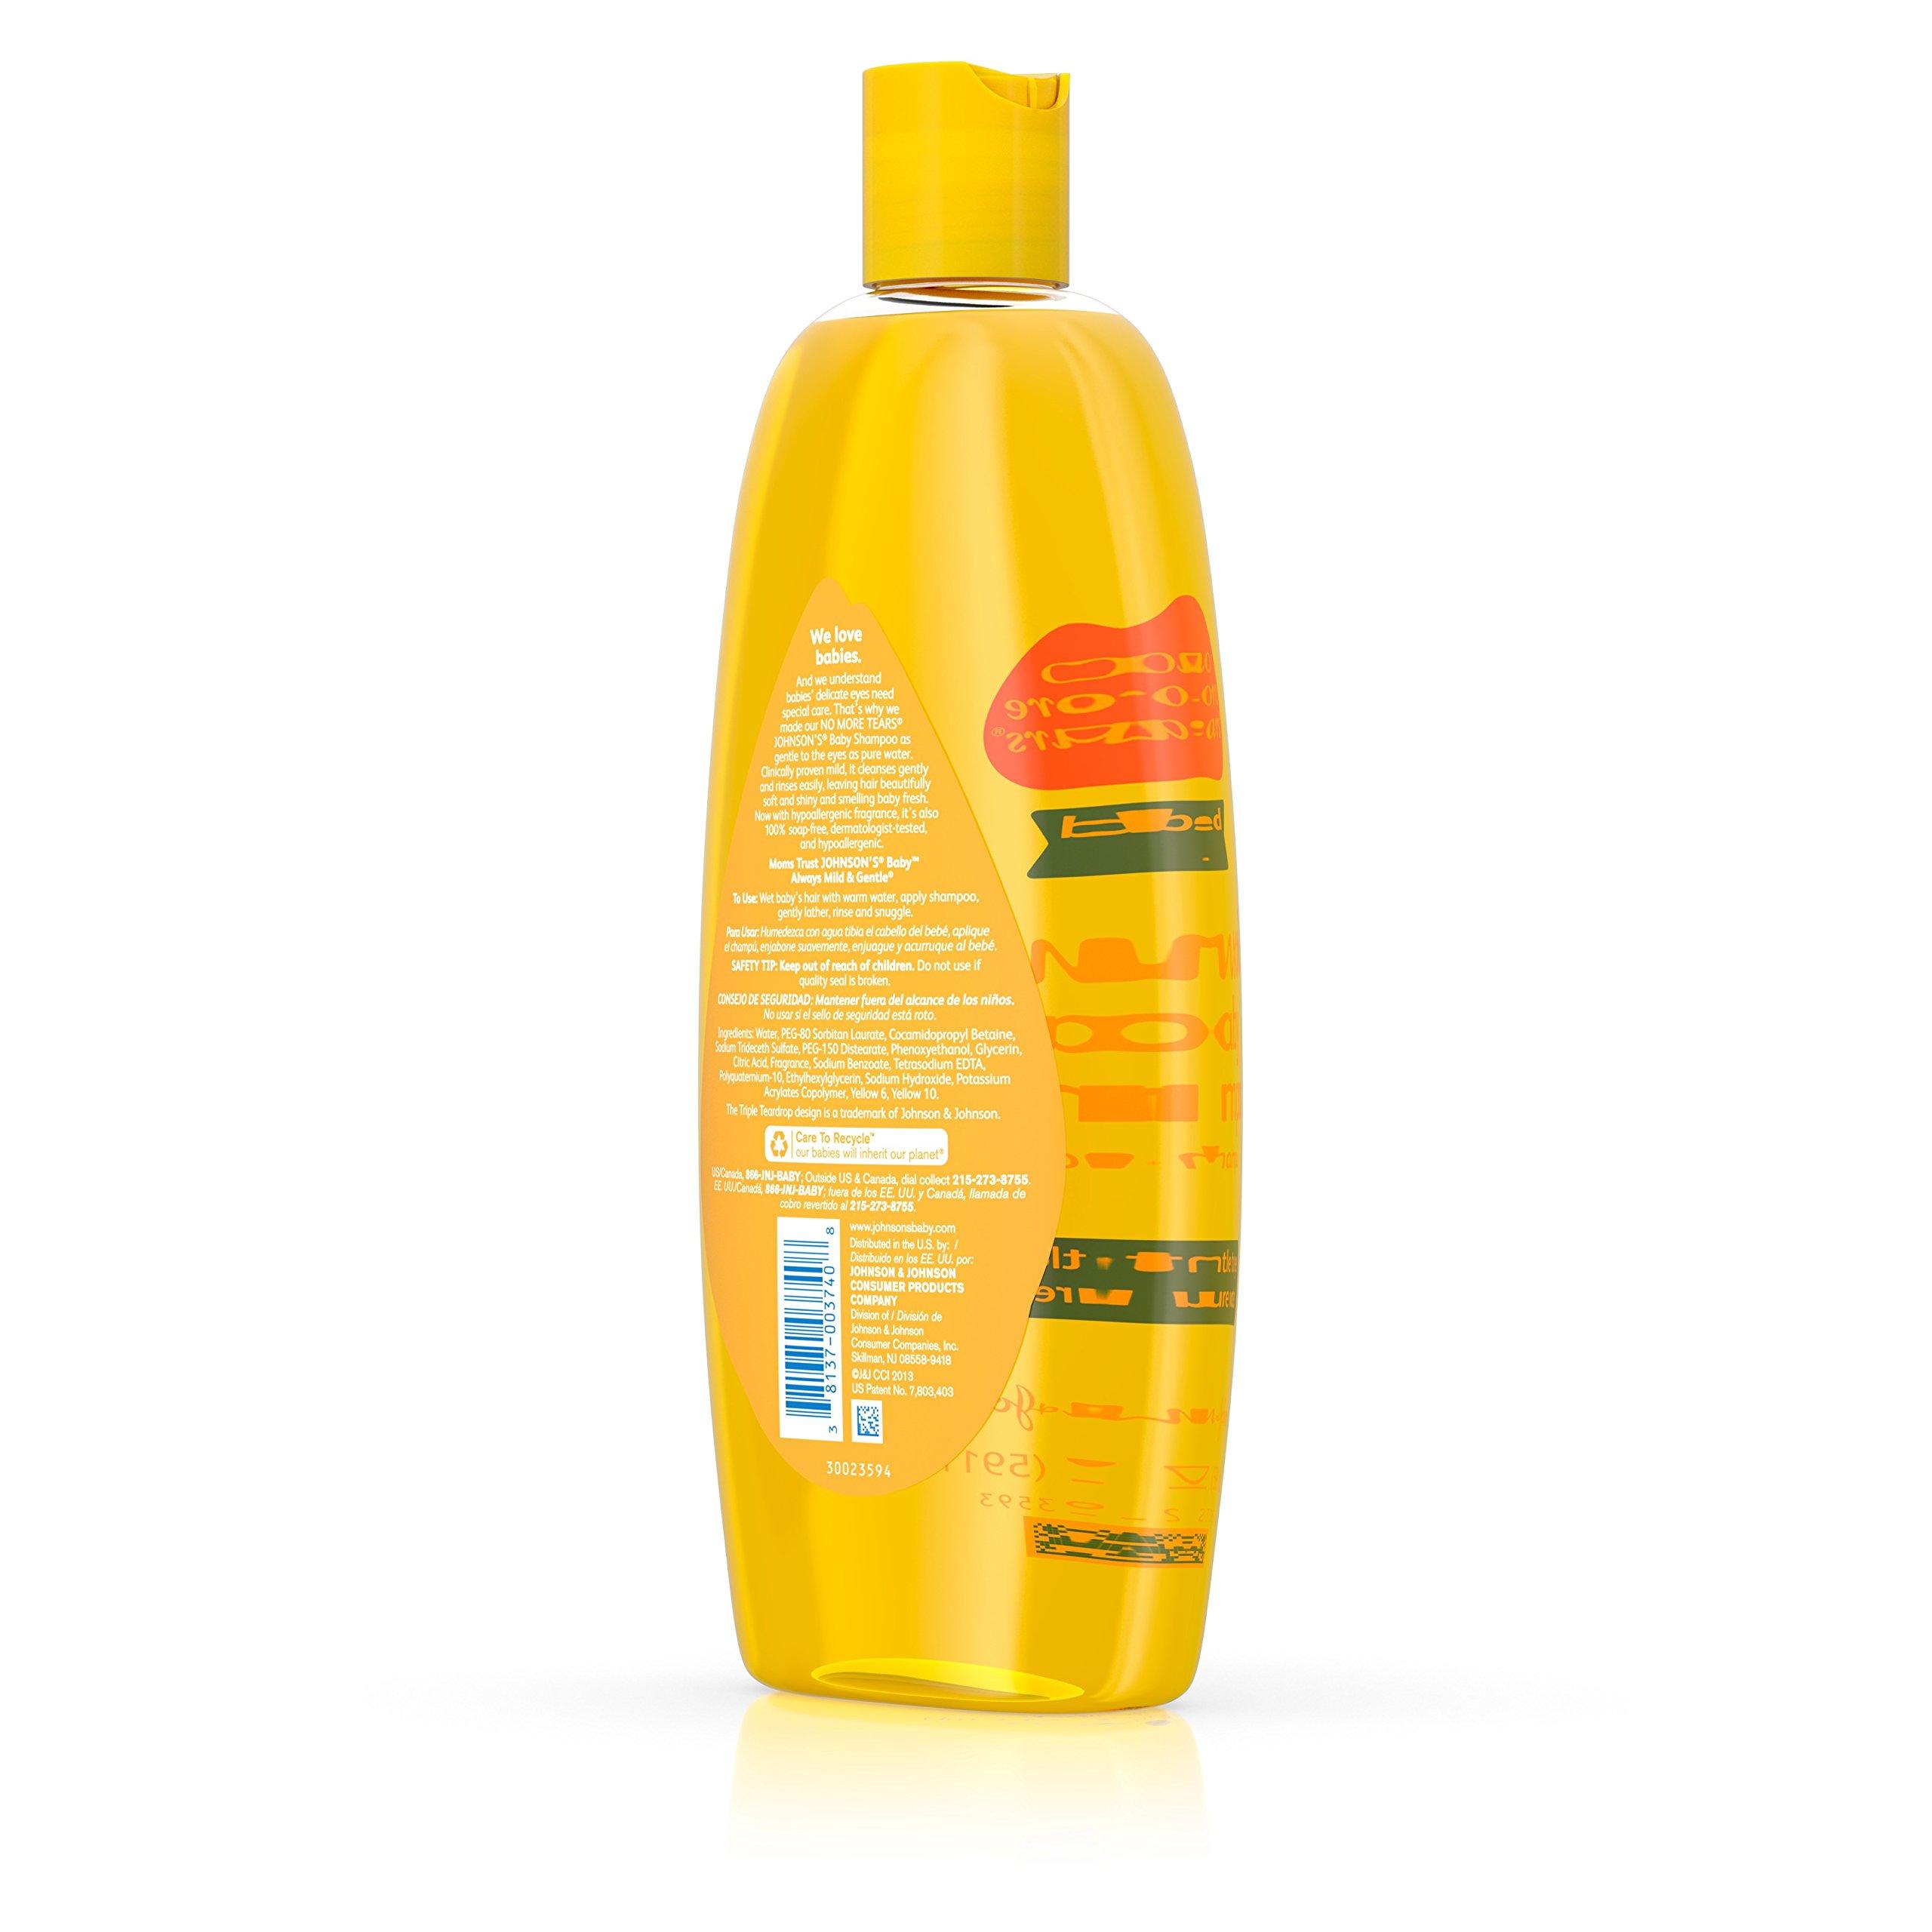 Johnson's Baby Tear Free Shampoo, 20 Fl. Oz. | Amazon